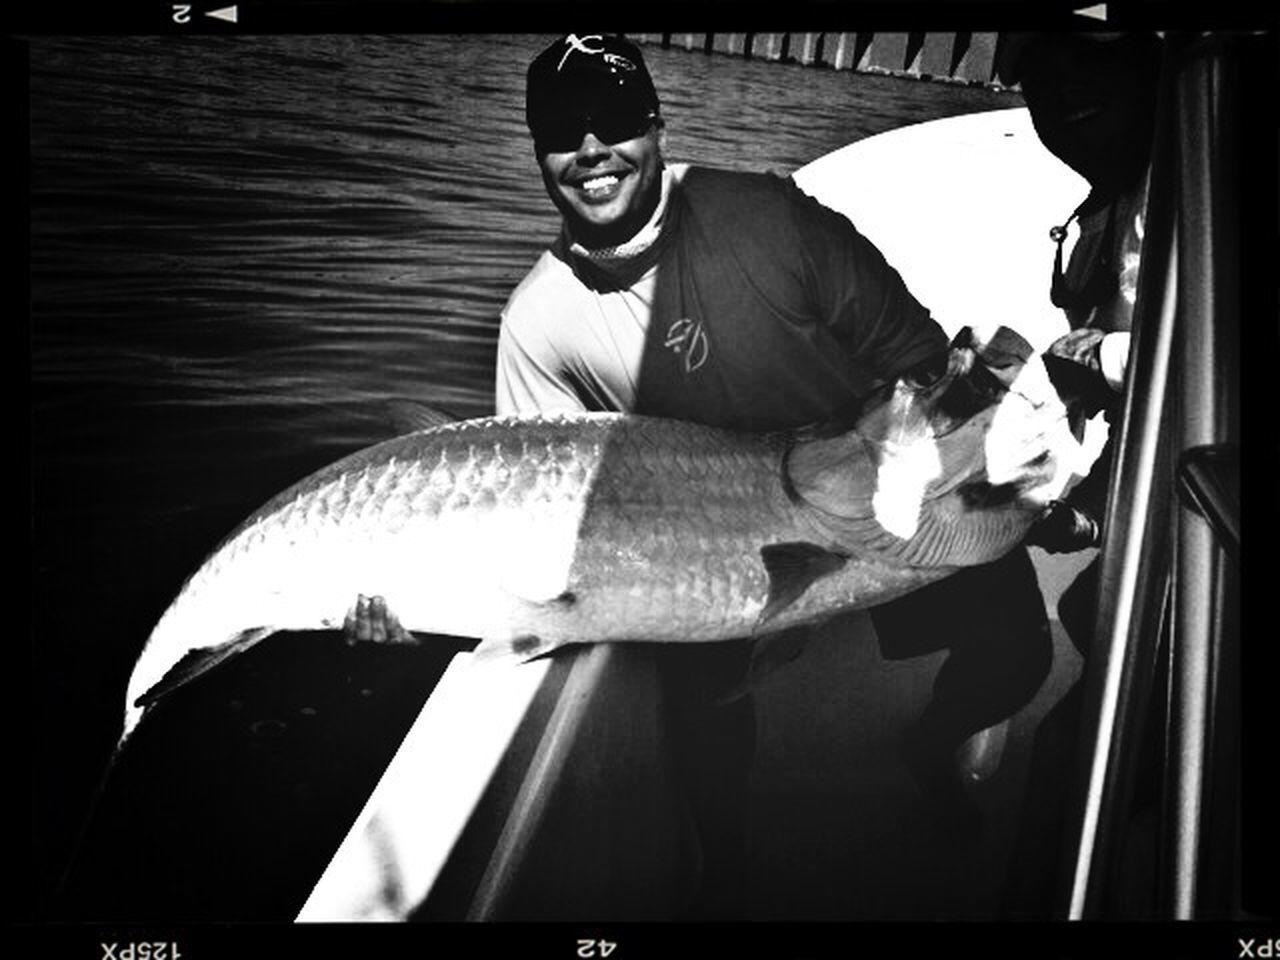 I Love My Job! Fishing Work Tarpon